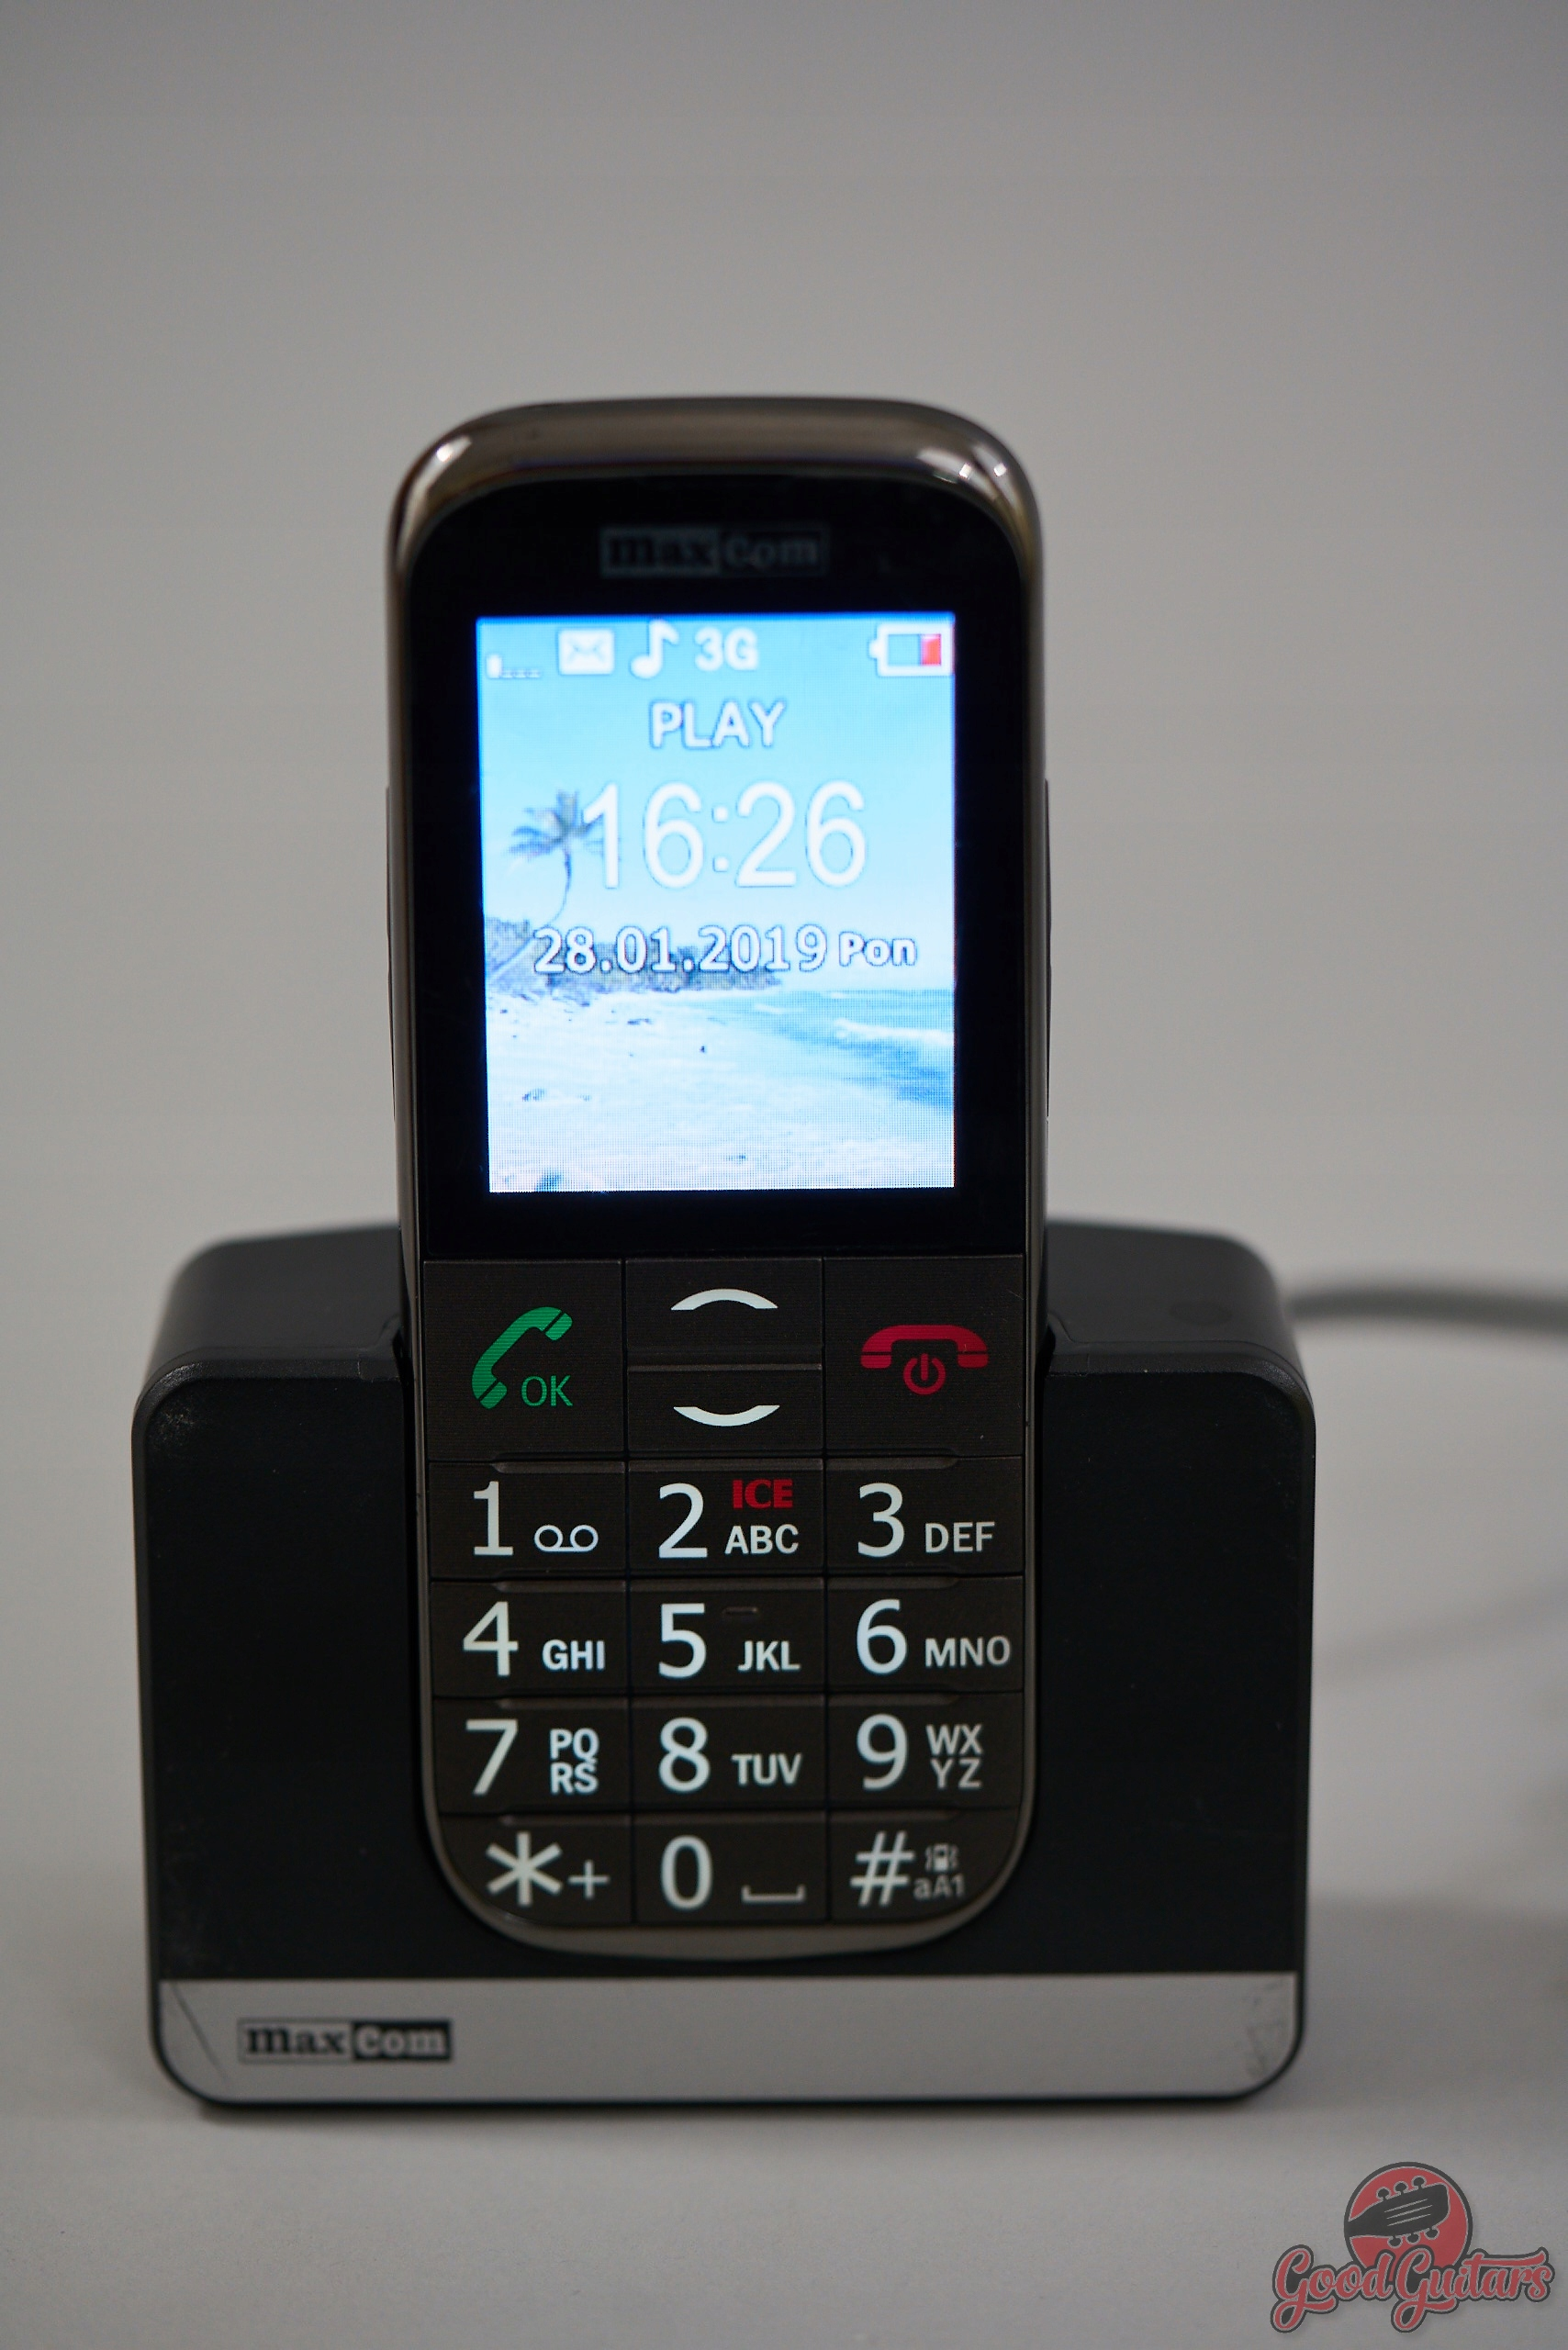 MAXCOM MM 721 BB Telefon gsm 3G Stacjonarny komórk